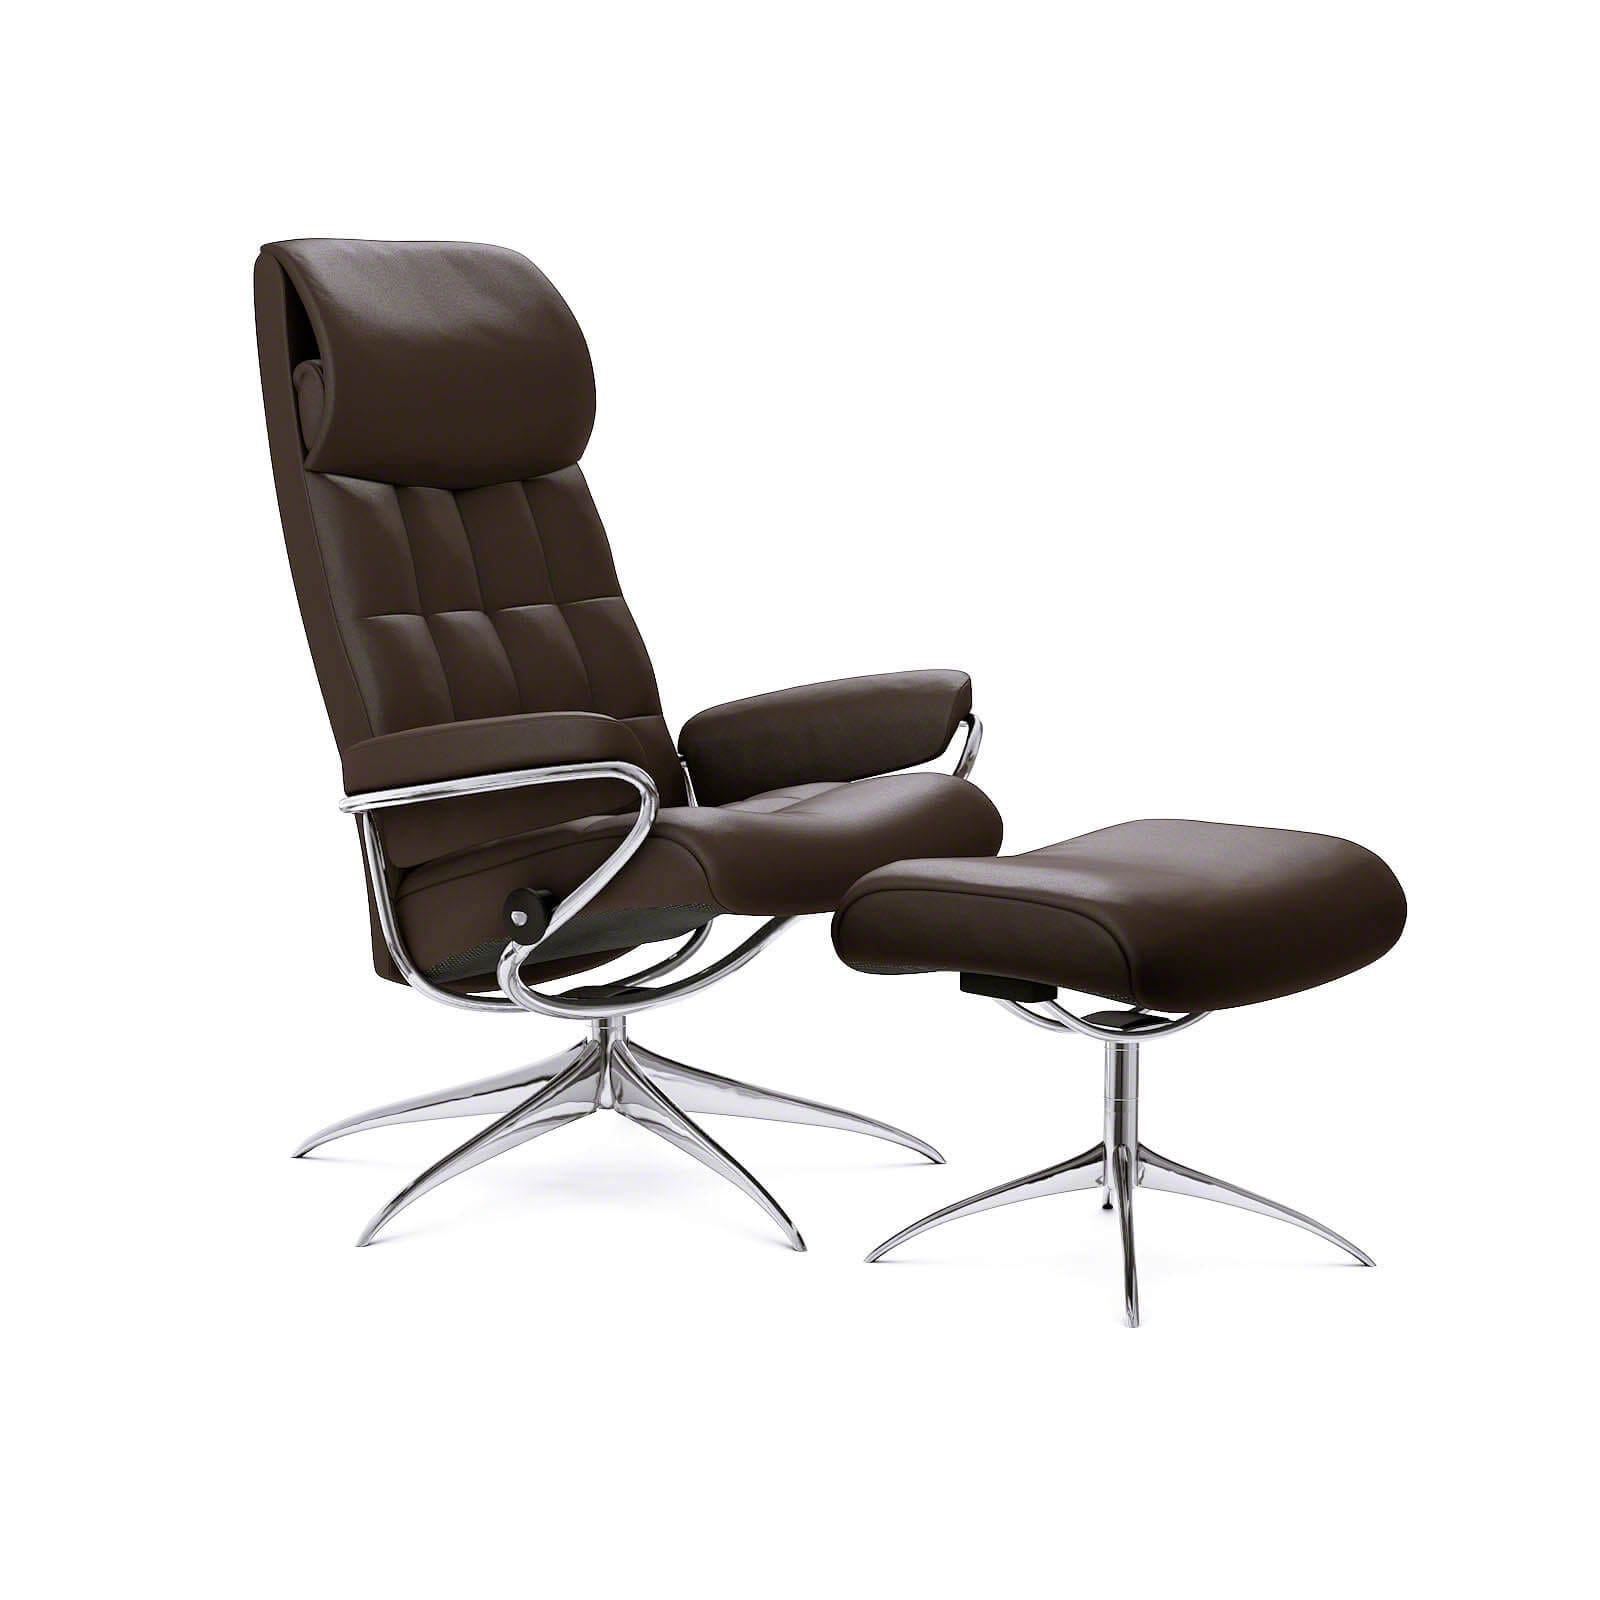 stressless london sessel mit hoher lehne lederfarbe chestnut. Black Bedroom Furniture Sets. Home Design Ideas